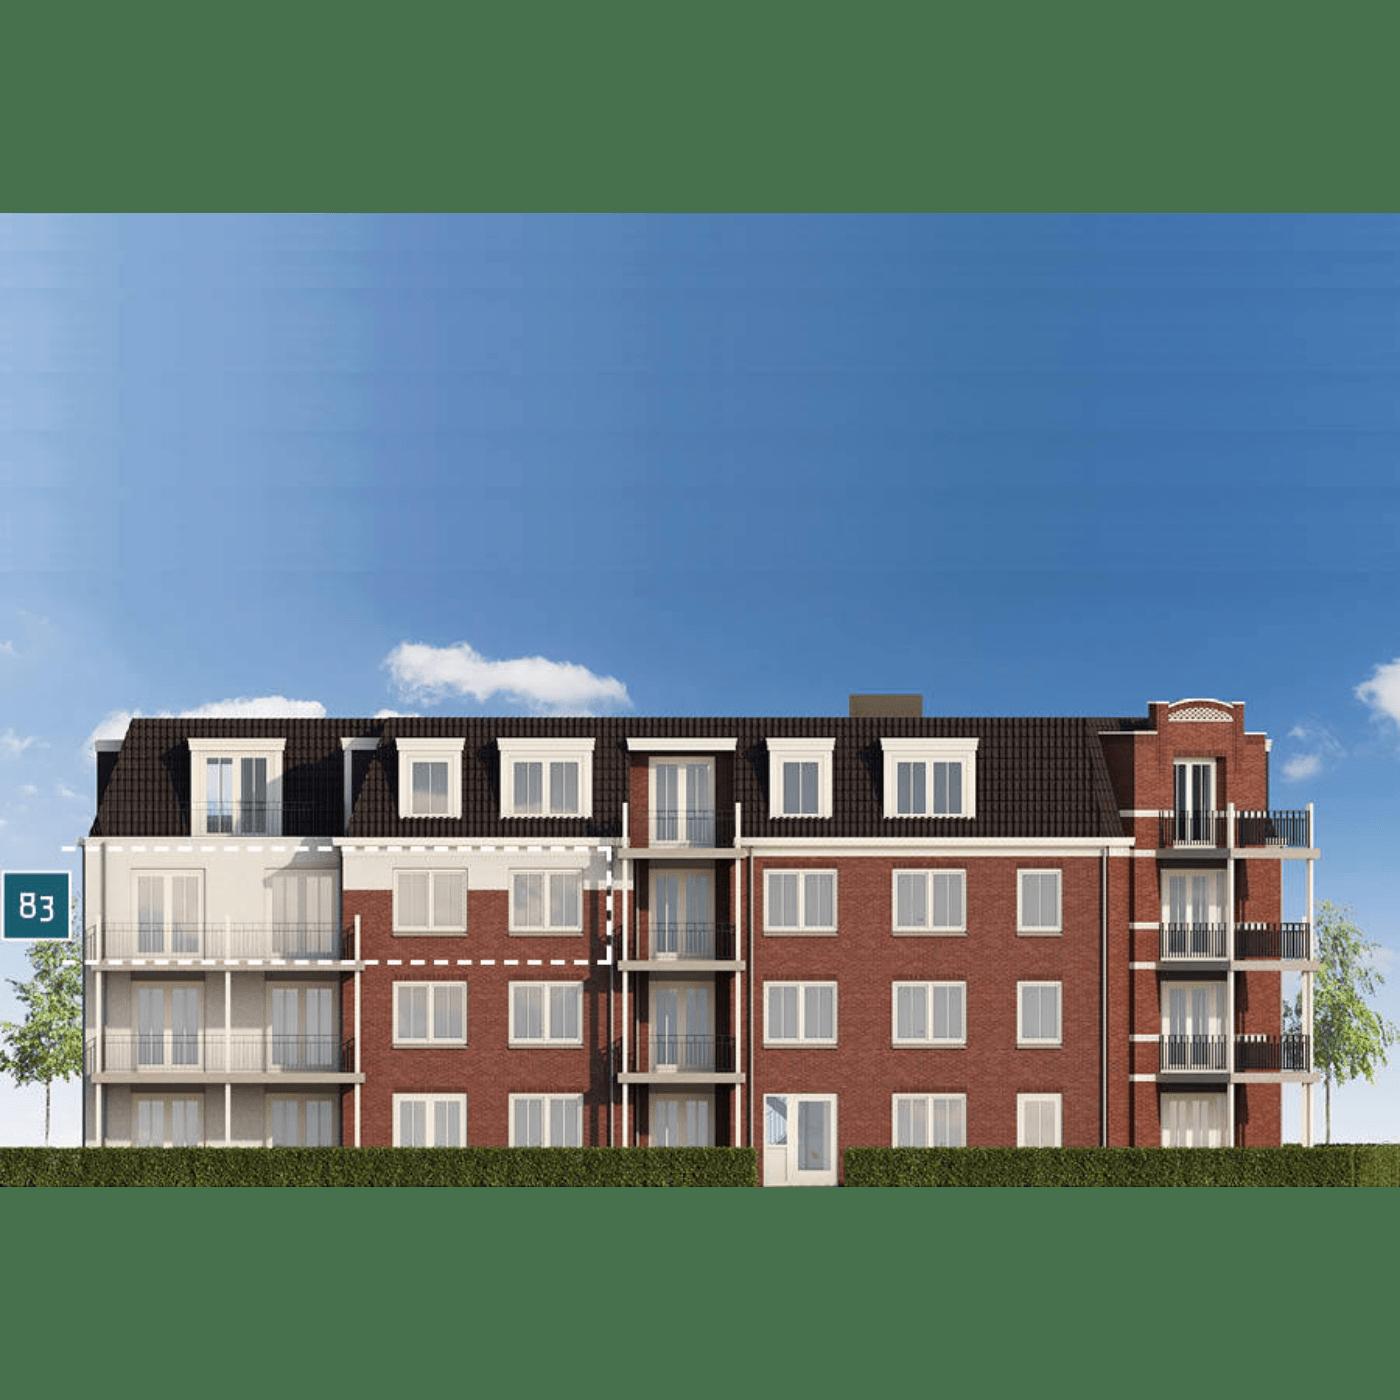 Huisdetail appartement 83